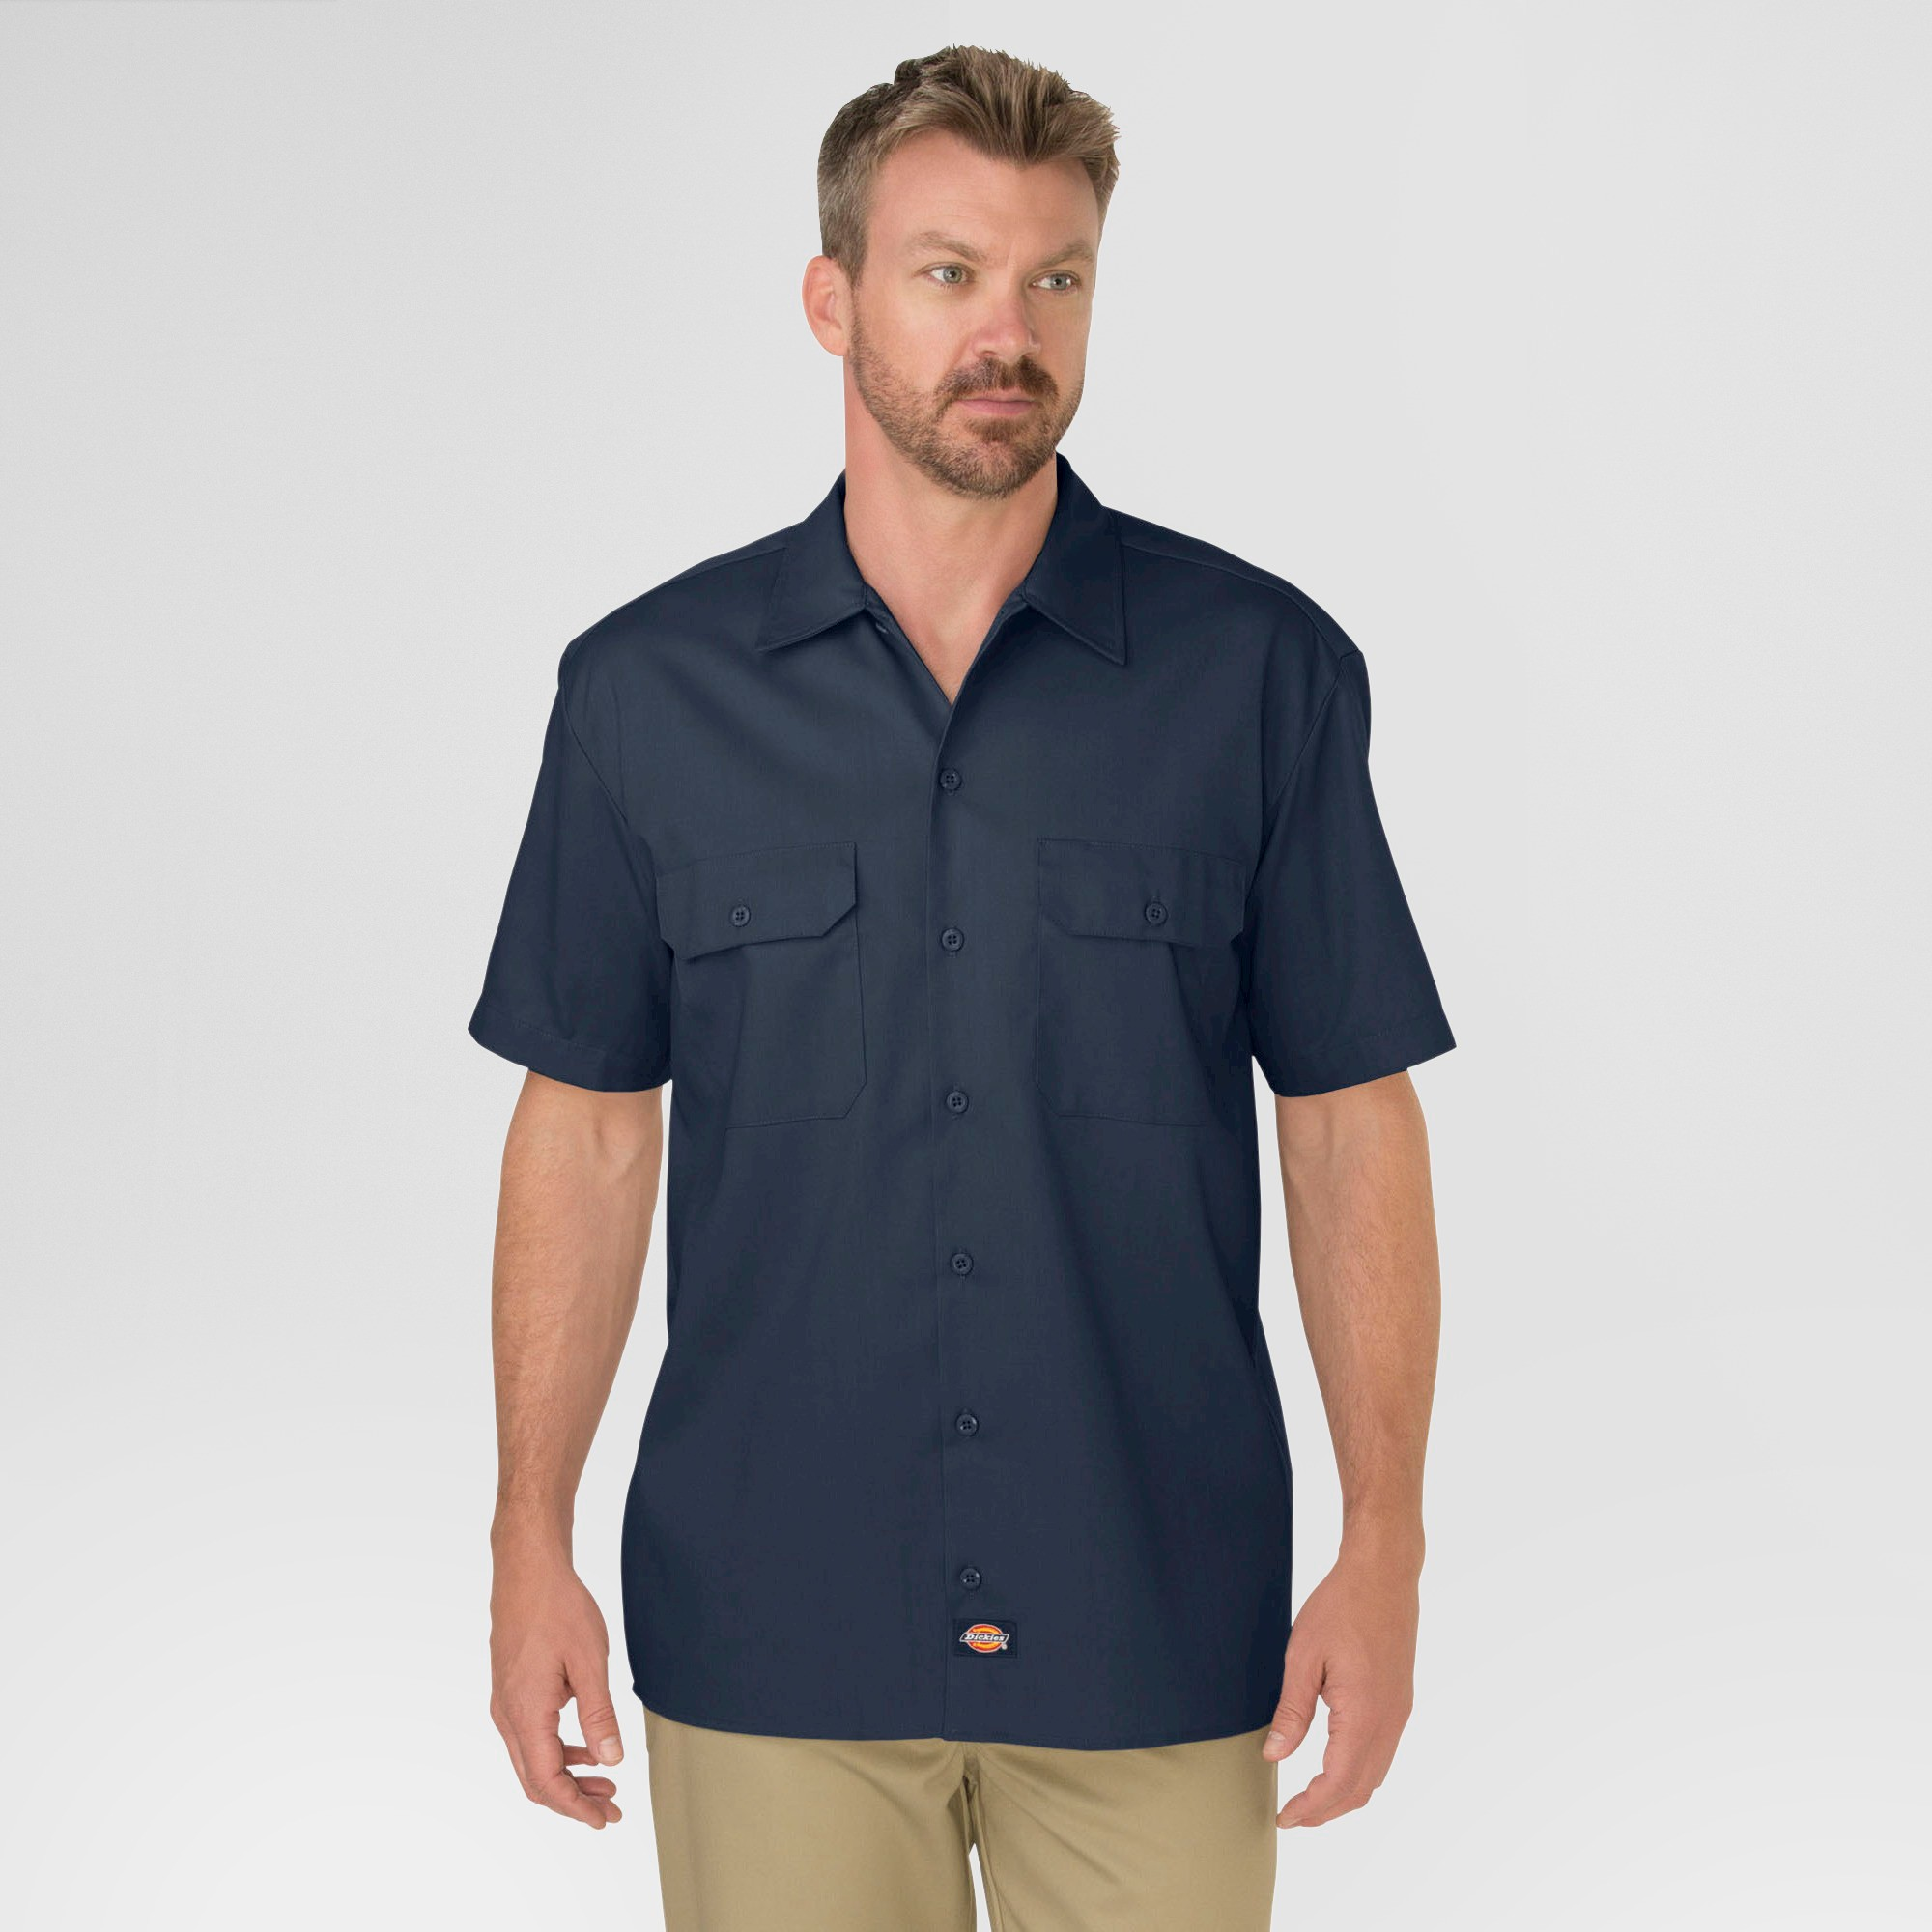 petiteDickies Men's Tall Original Fit Short Sleeve Twill Work Shirt - Dark Navy XLT, Men's, Dark Blue